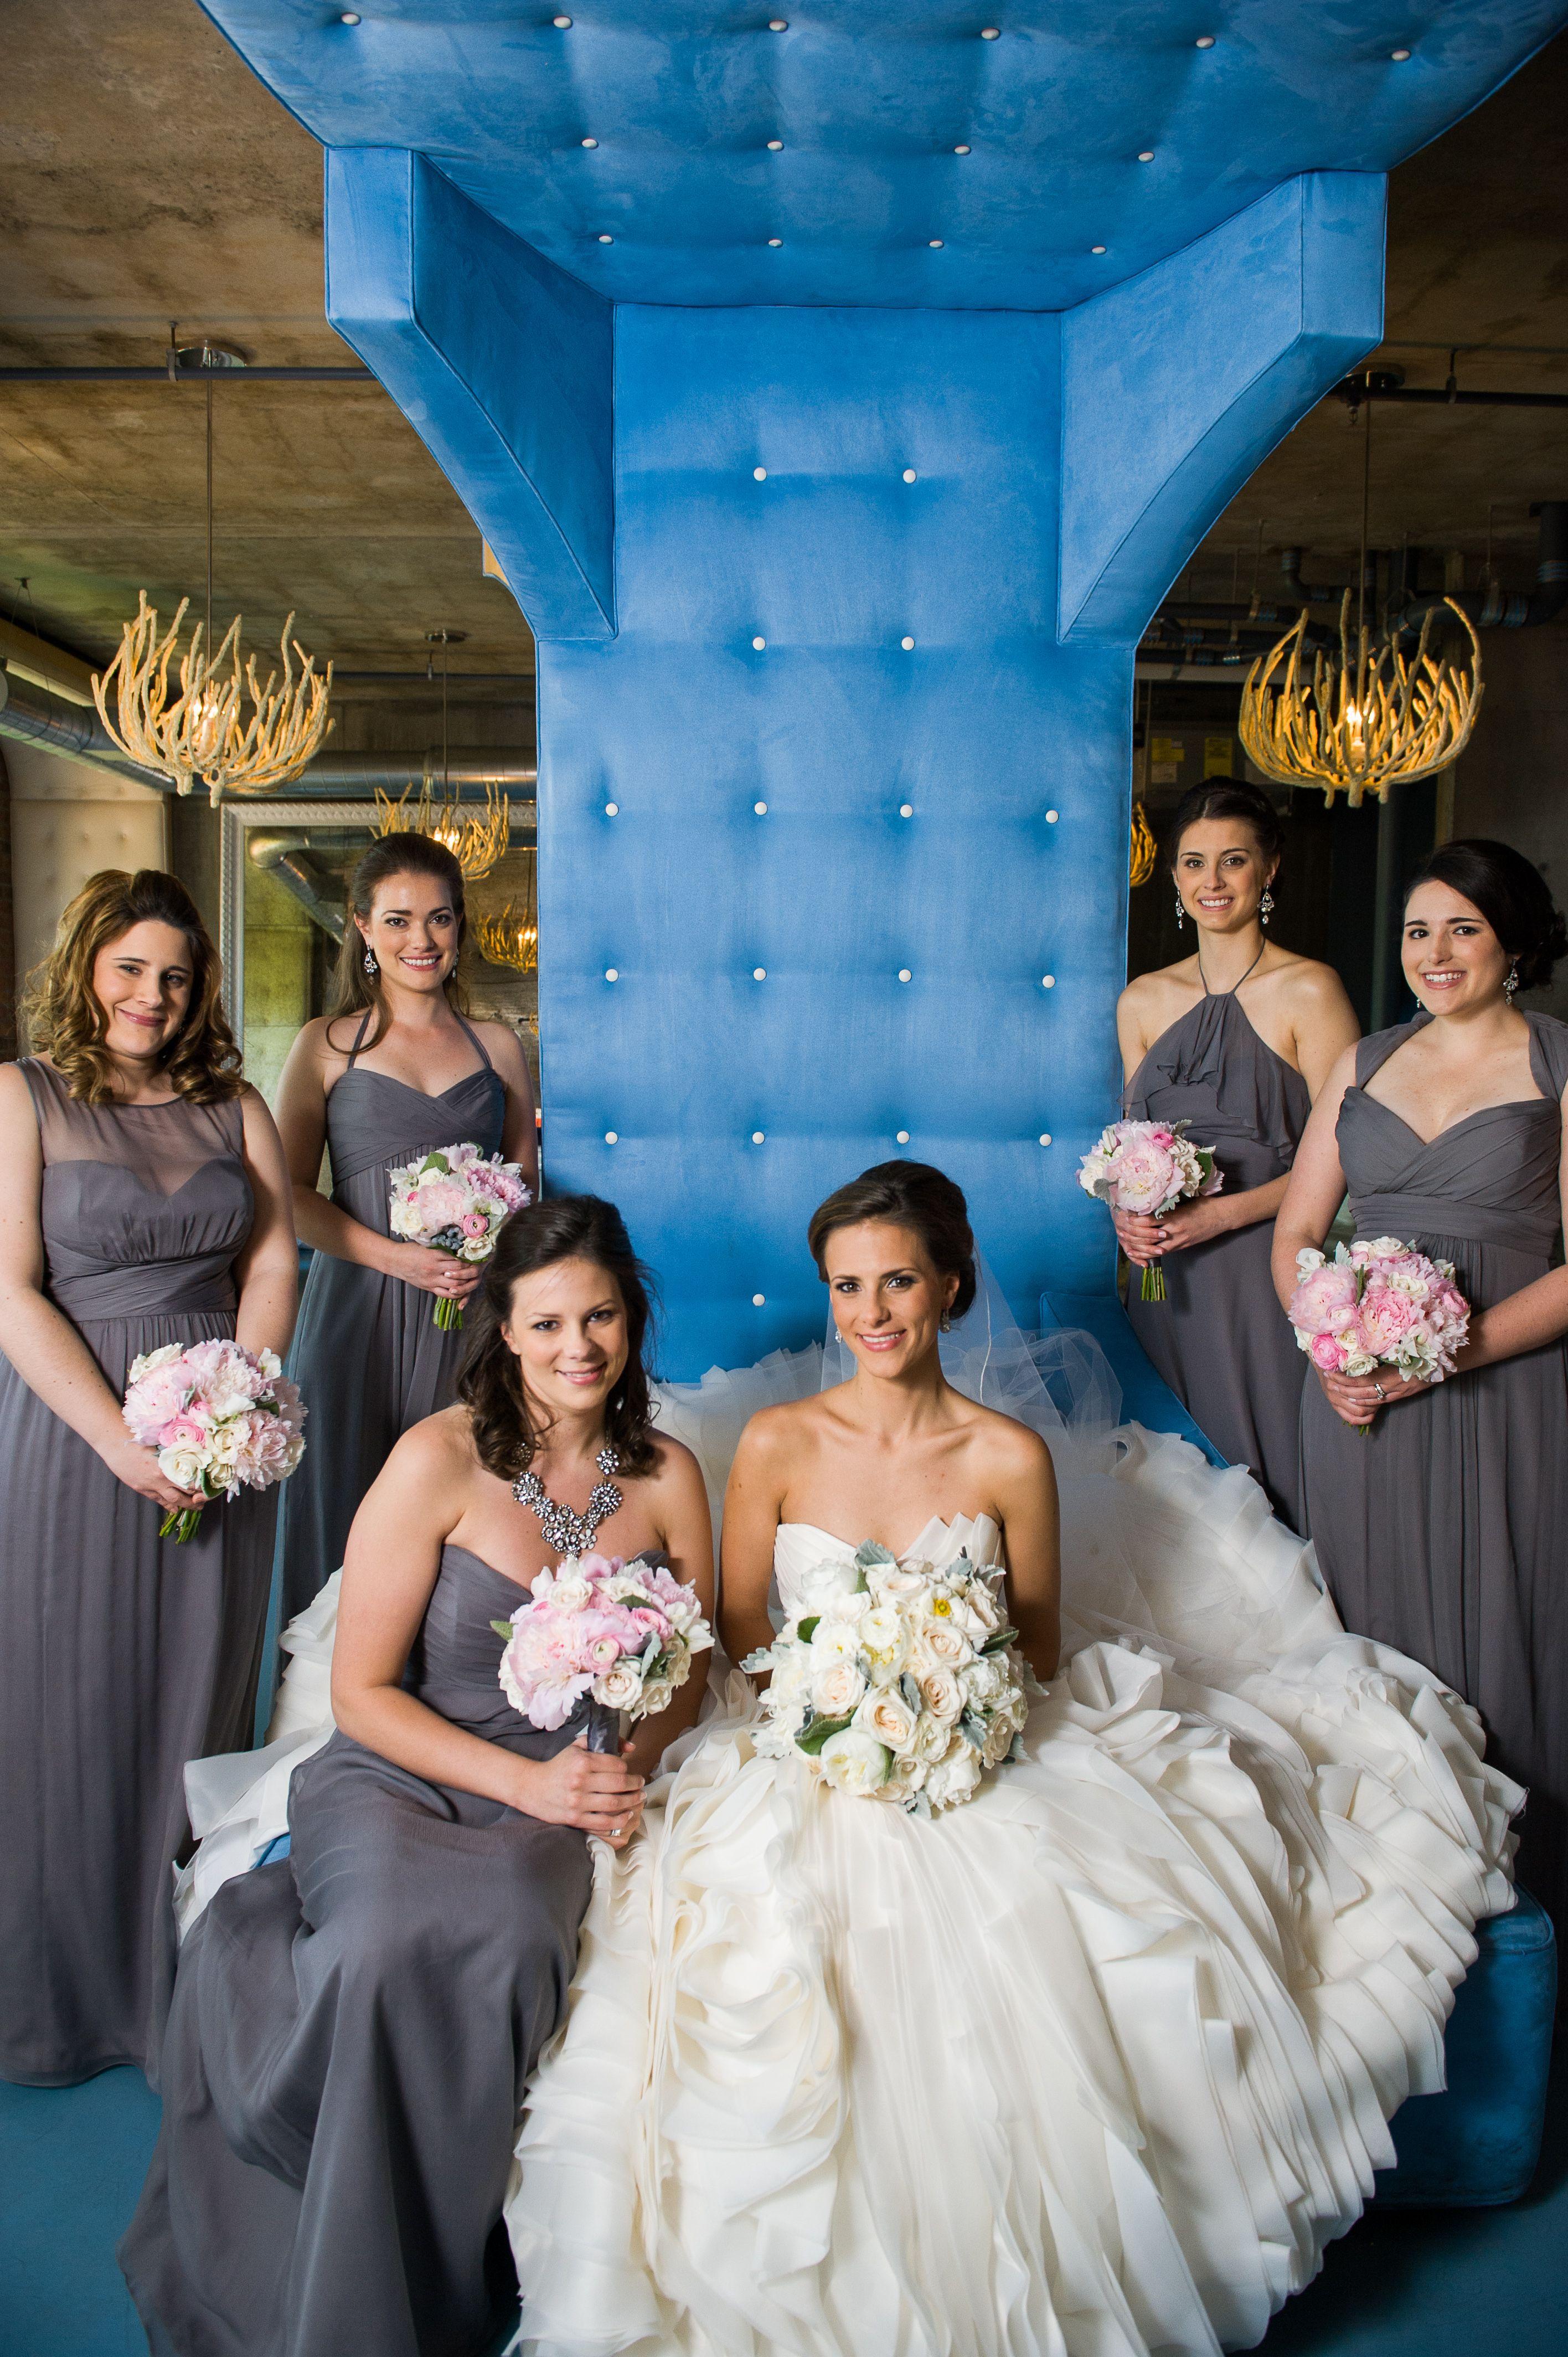 Congratulations to Meredith of Bella Bridesmaids NYC and Madison, NJ ...